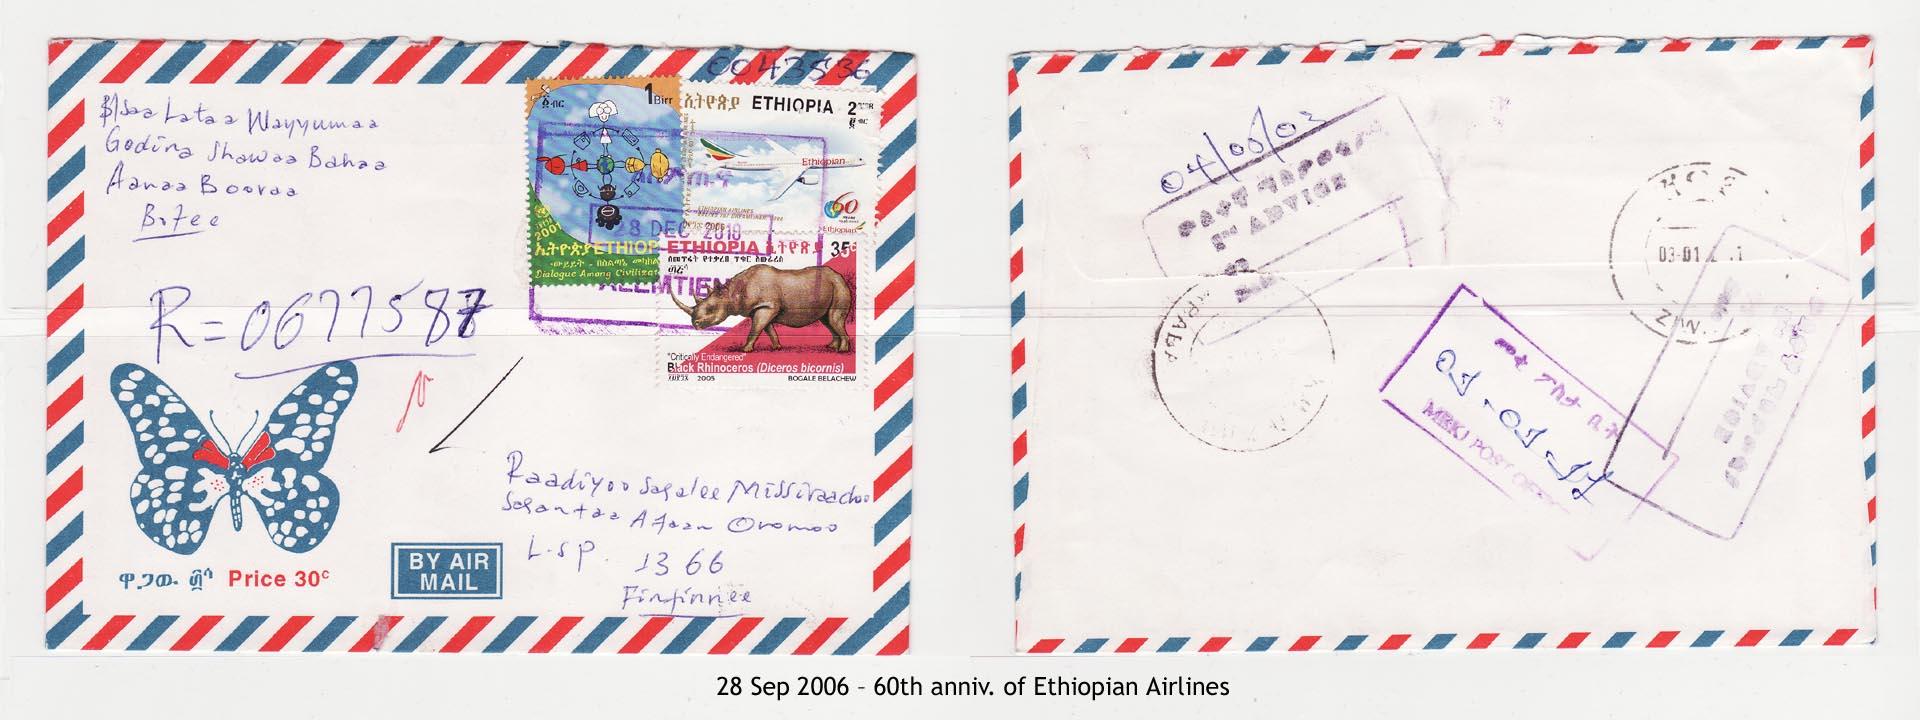 20060928 – 60th anniv. of Ethiopian Airlines